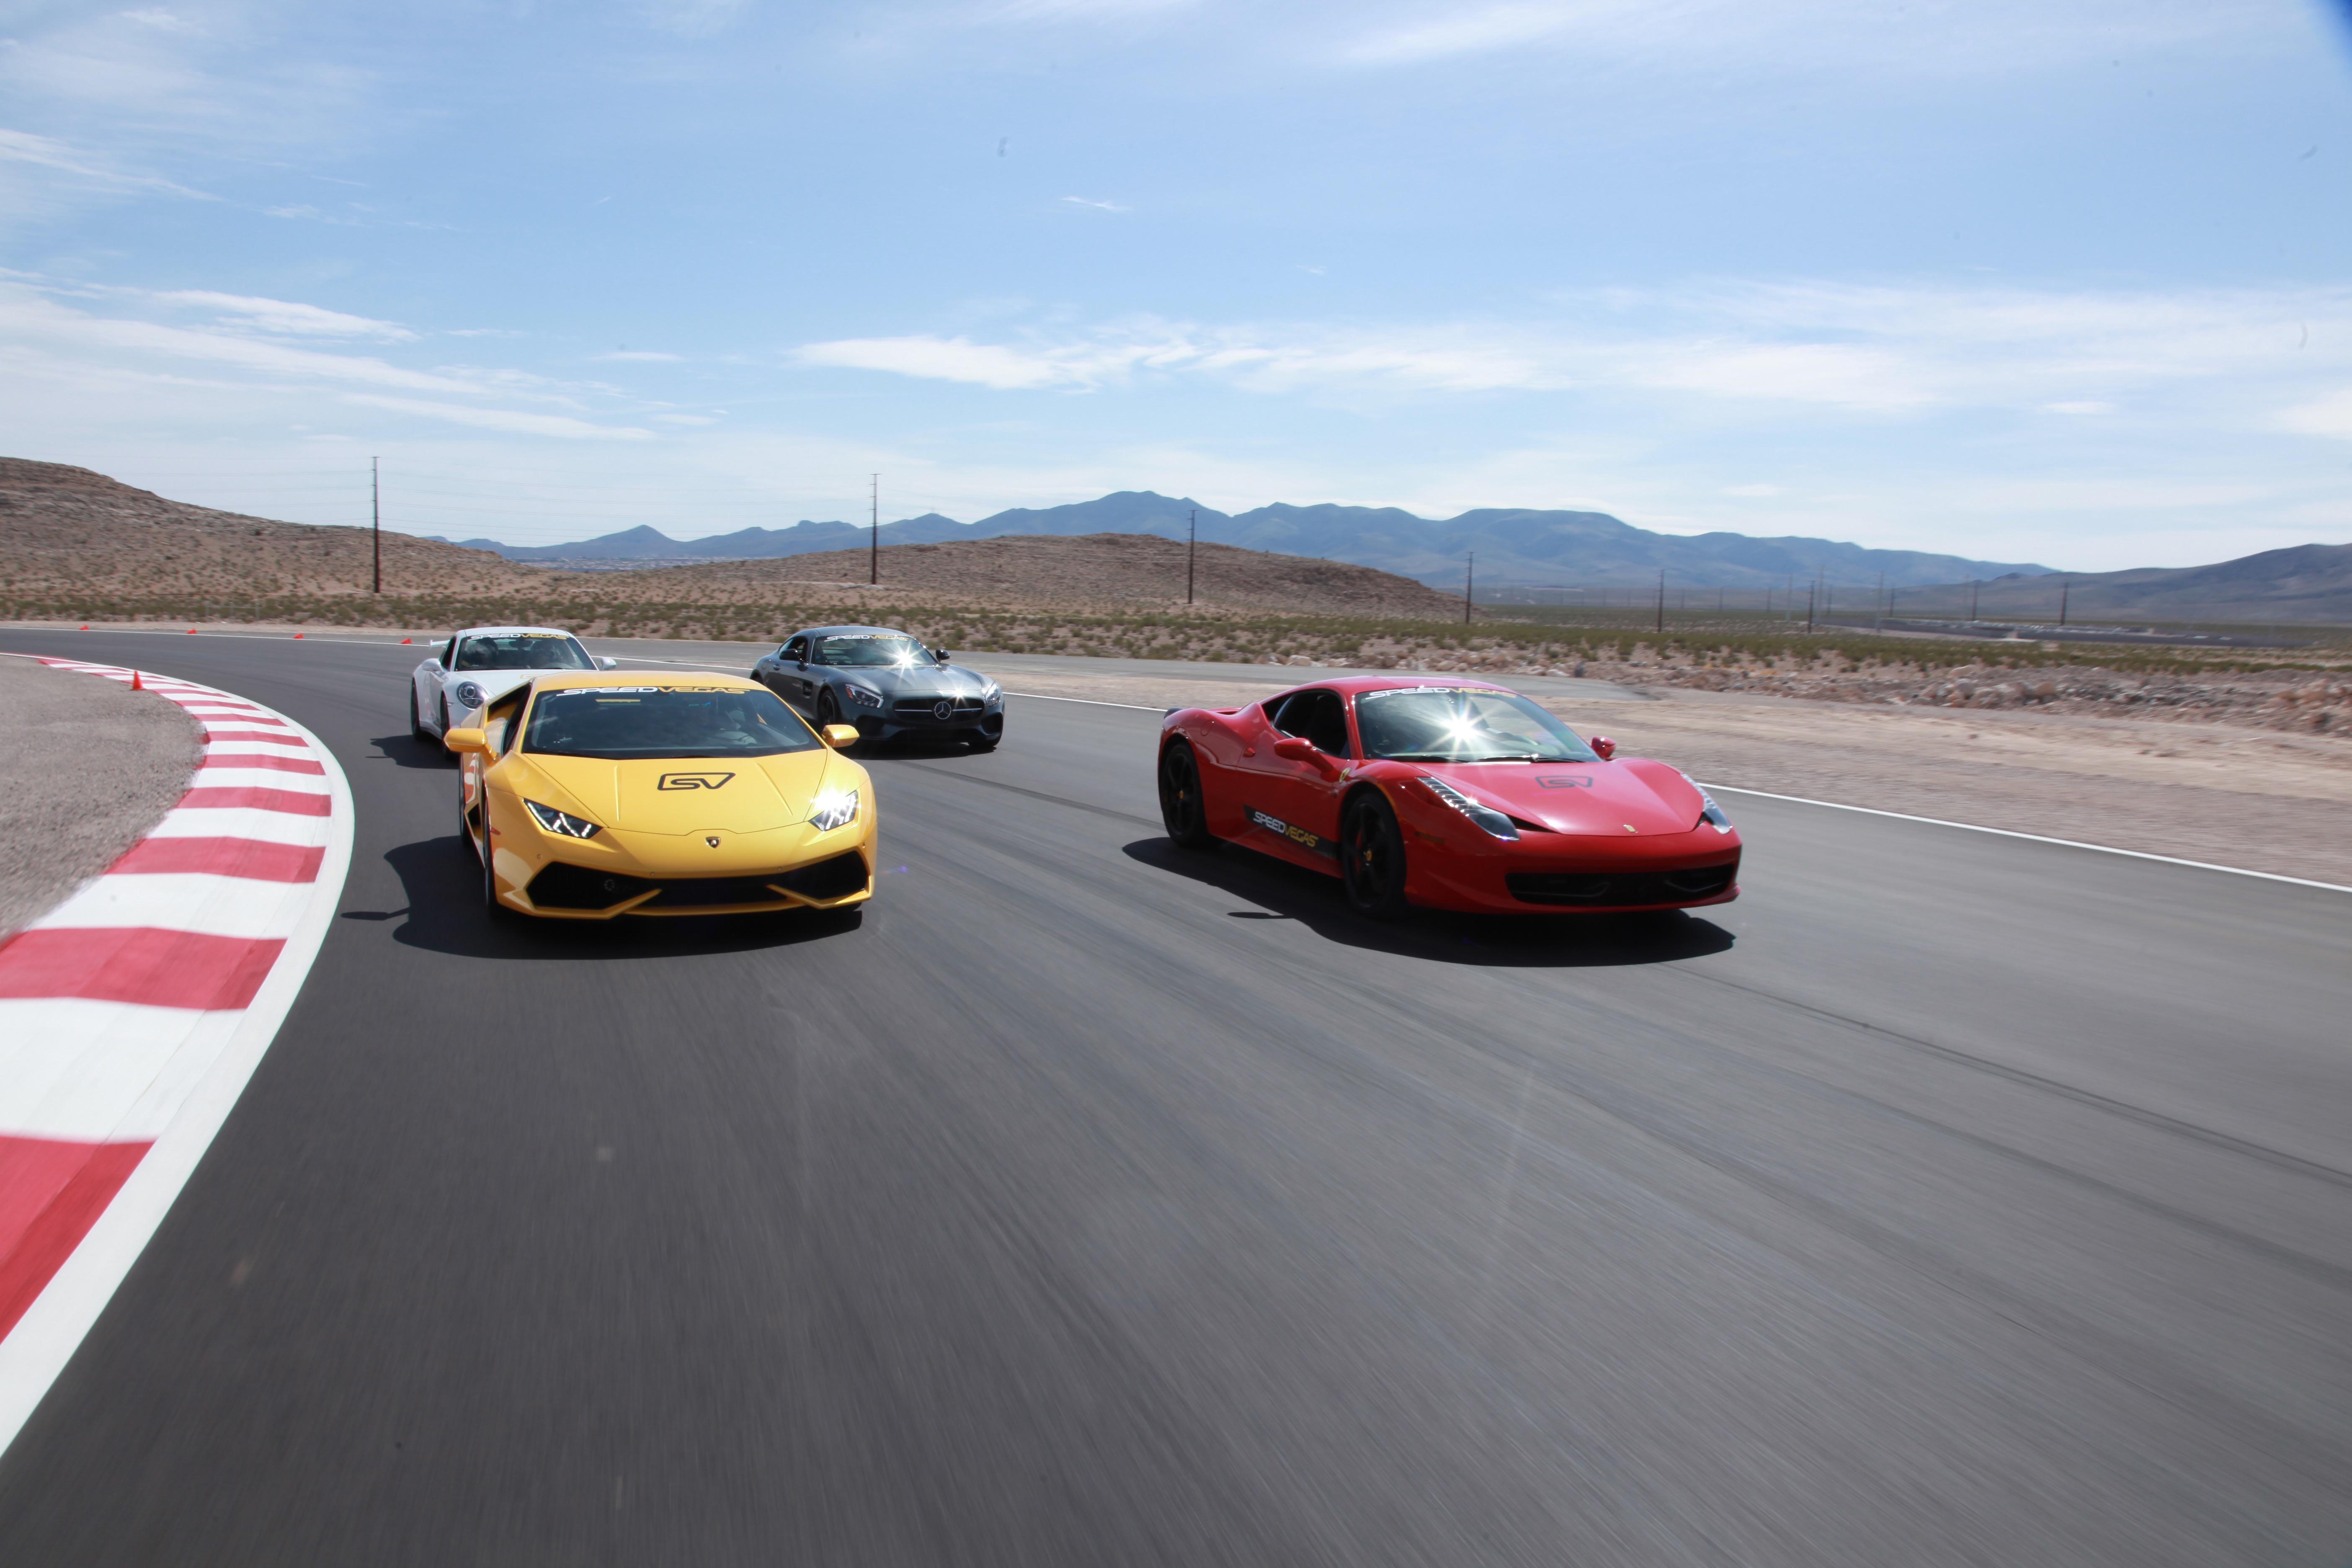 photos_VAP_speed_vegas_nv_Speed_Vegas_Fo